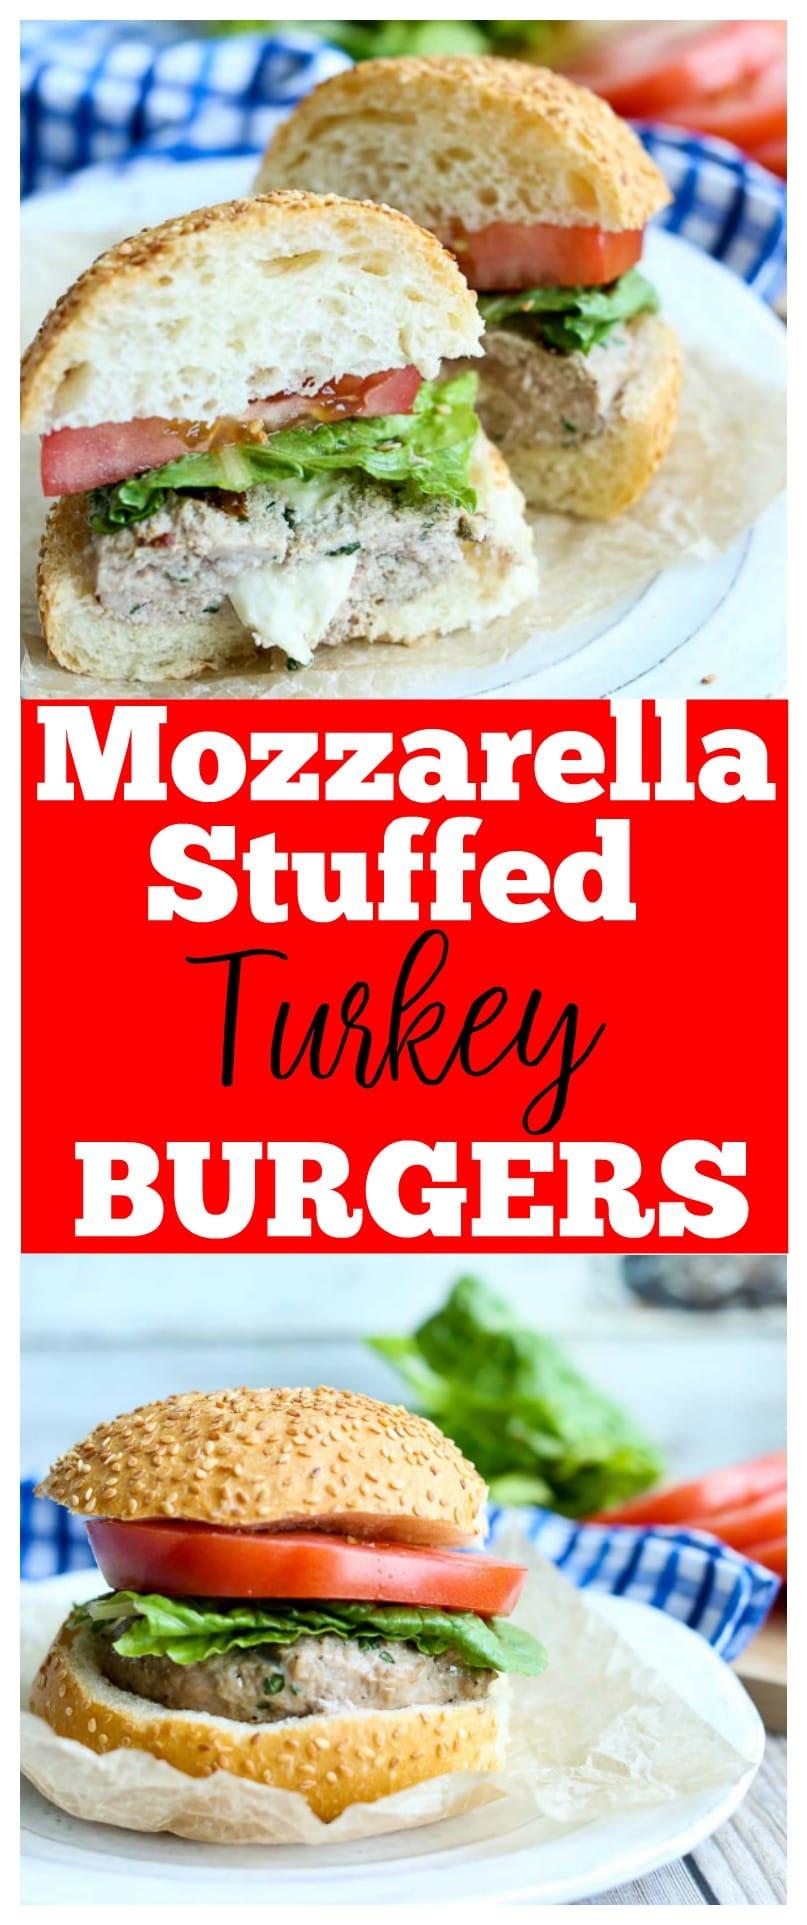 turkey burger | mozzarella stuffed turkey burger | fresh basil | healthy | gluten-free | grilling recipes | summer recipes |